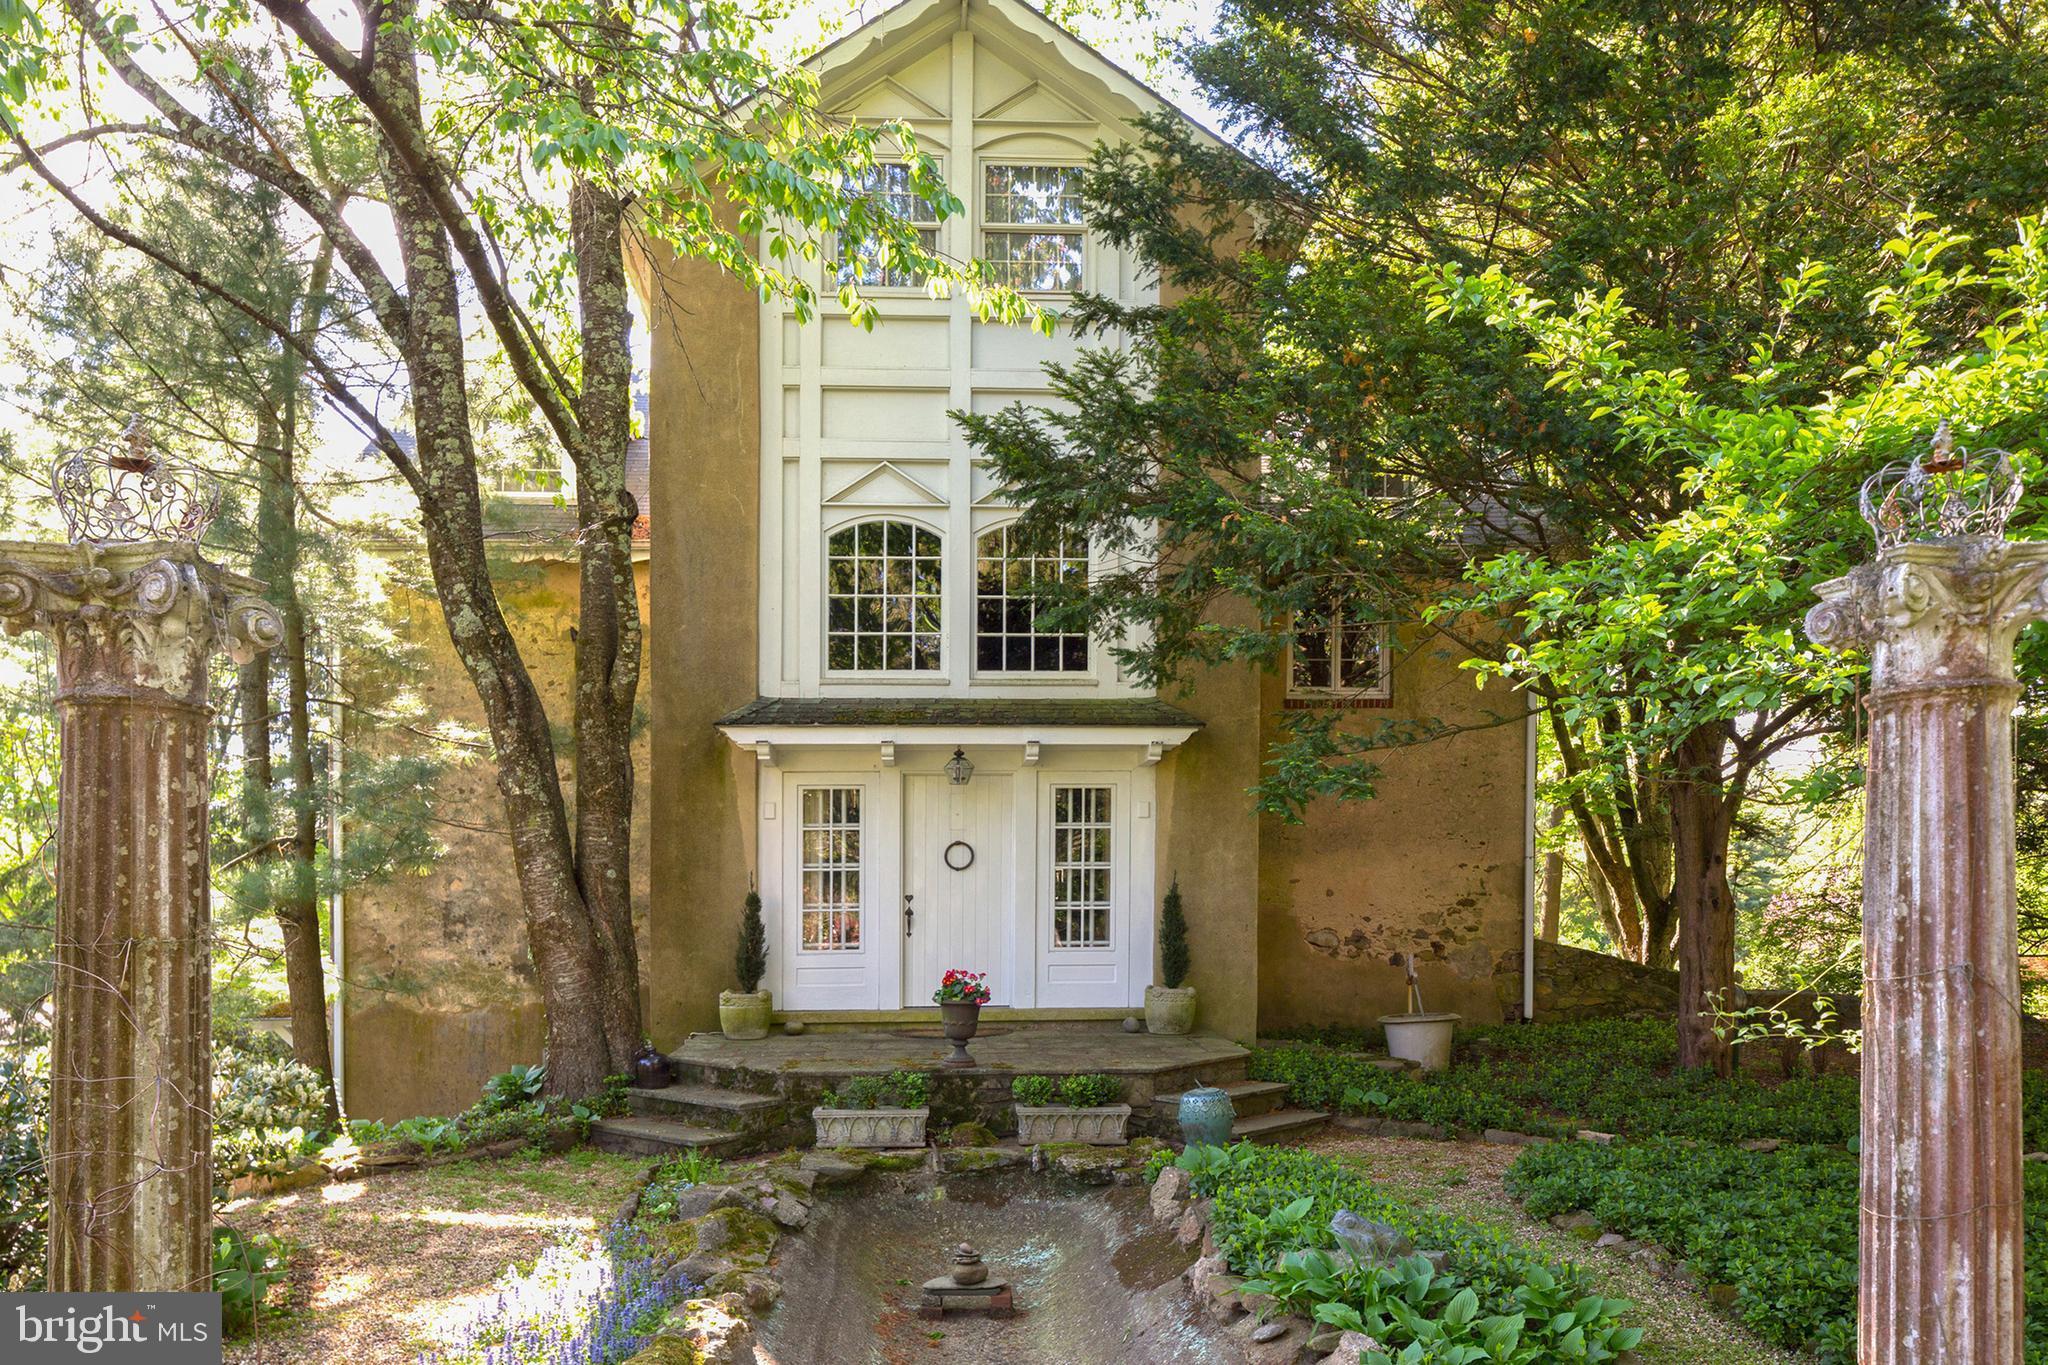 3136 BURNT HOUSE HILL ROAD, DOYLESTOWN, PA 18902